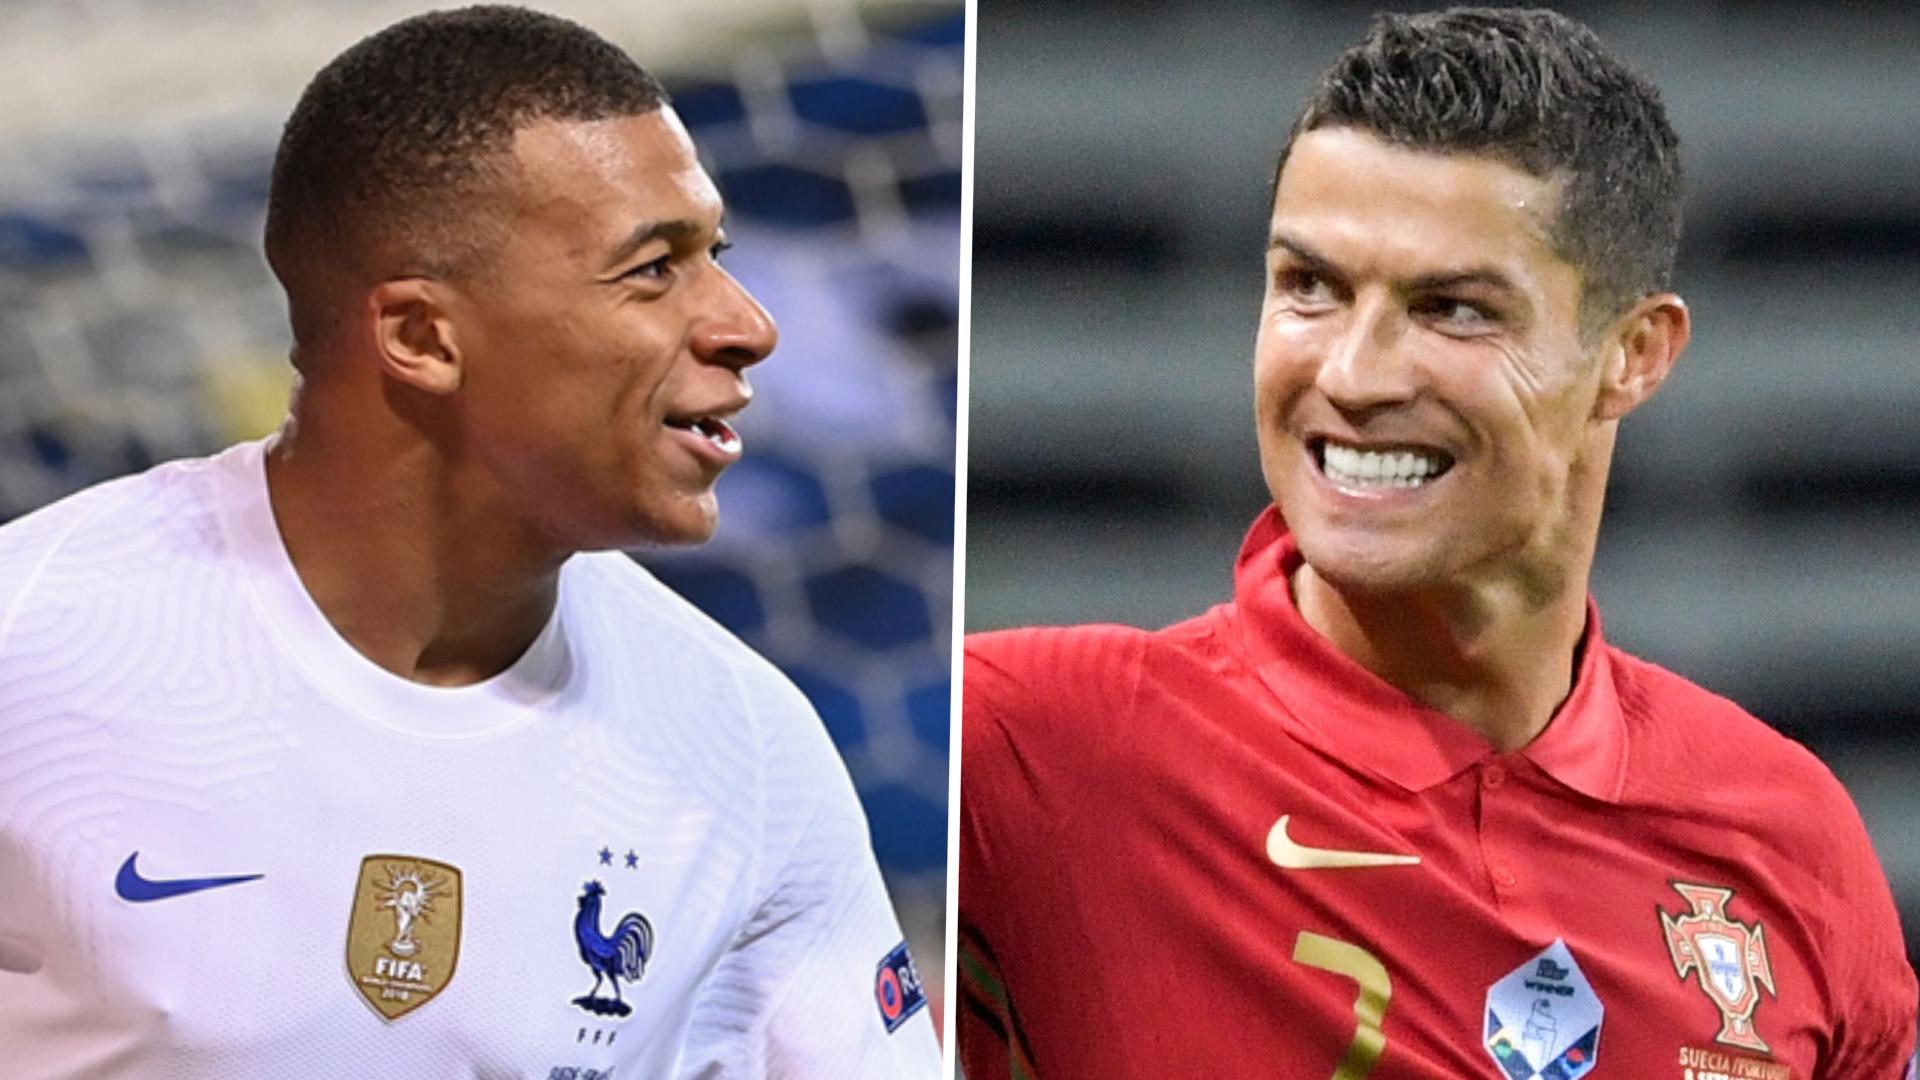 'We wish you a Merry Christmas!' - Ronaldo, Mbappe and footballers around the world celebrate the festive season